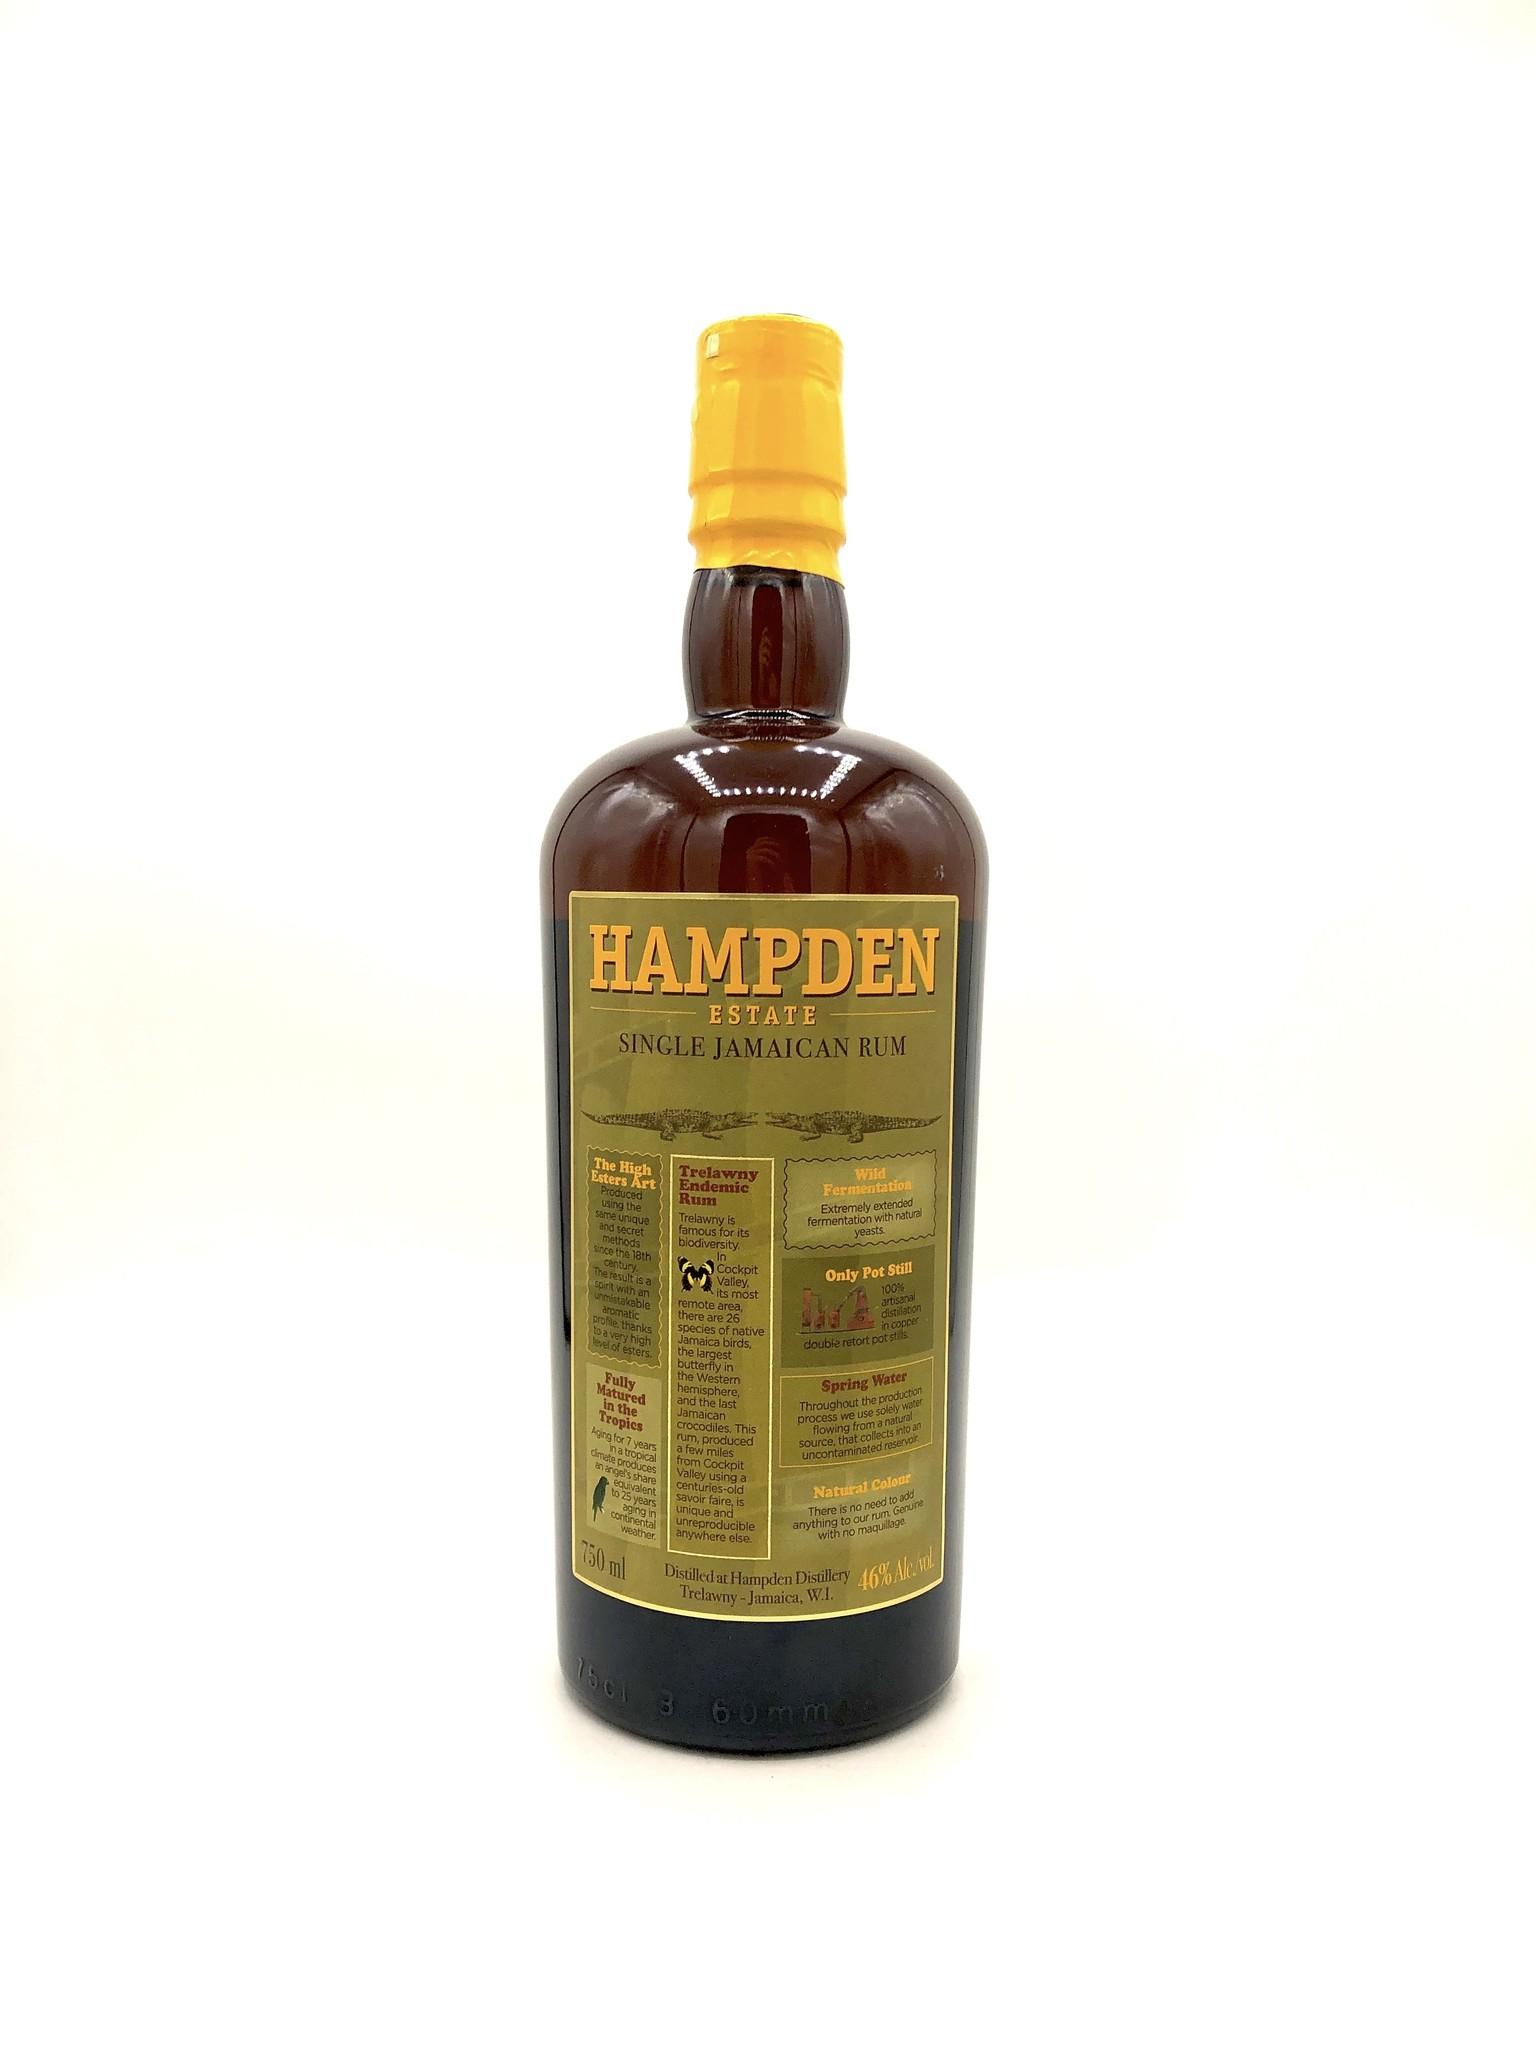 Pure Single Jamaican Rum, Hampden Estate